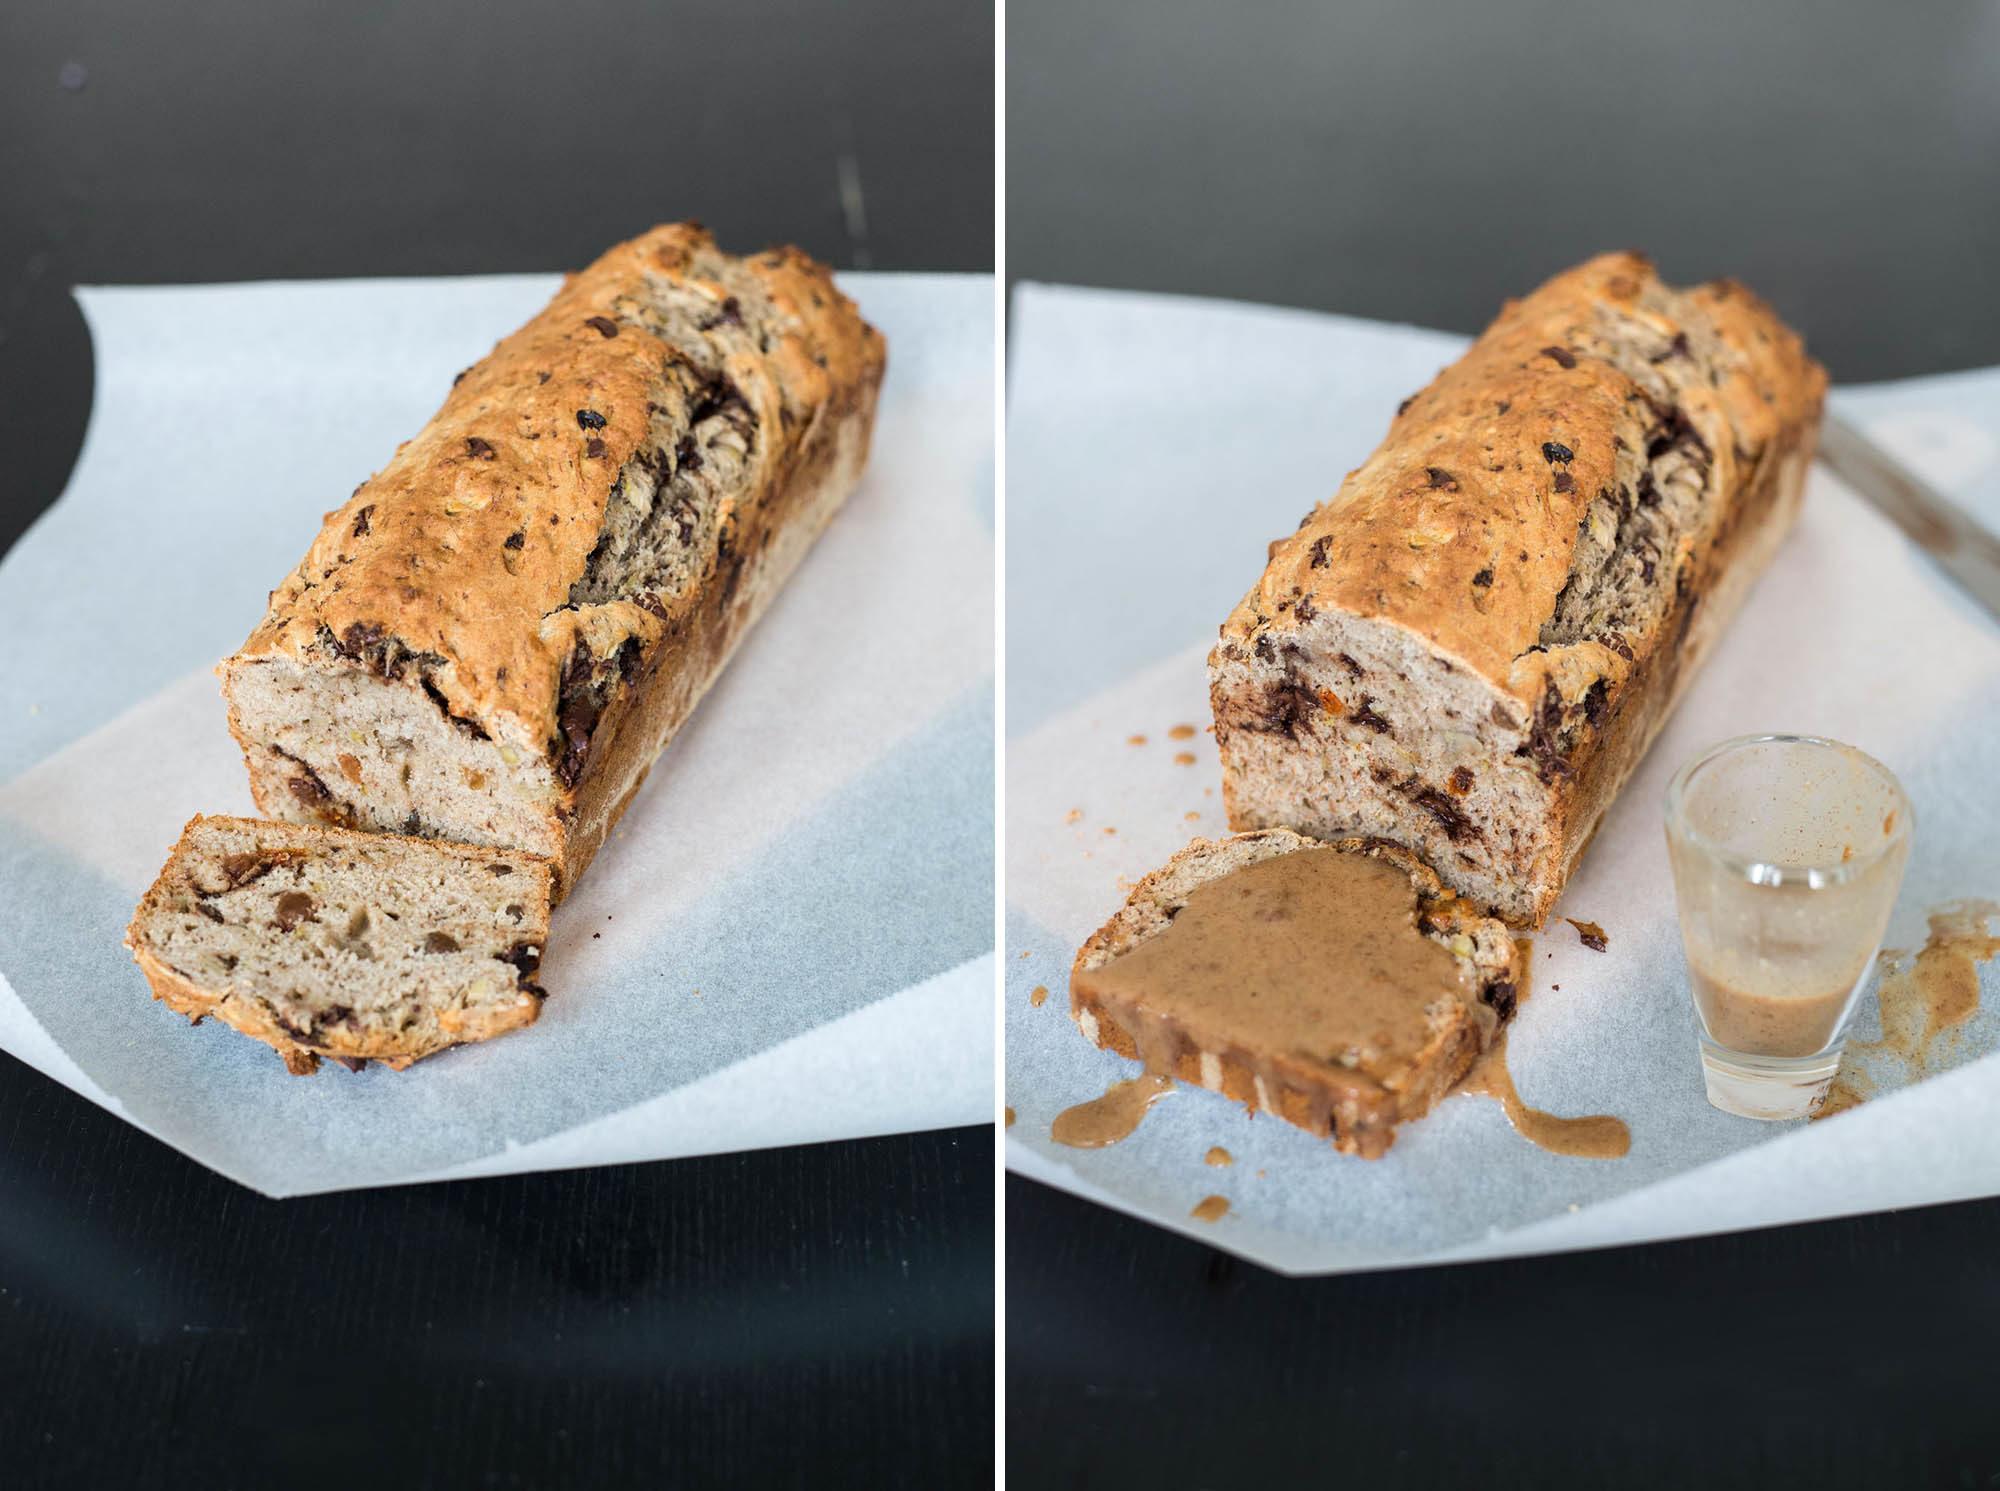 Vegan banana bread with a gluten-free option. Tastes like Christmas ❤️